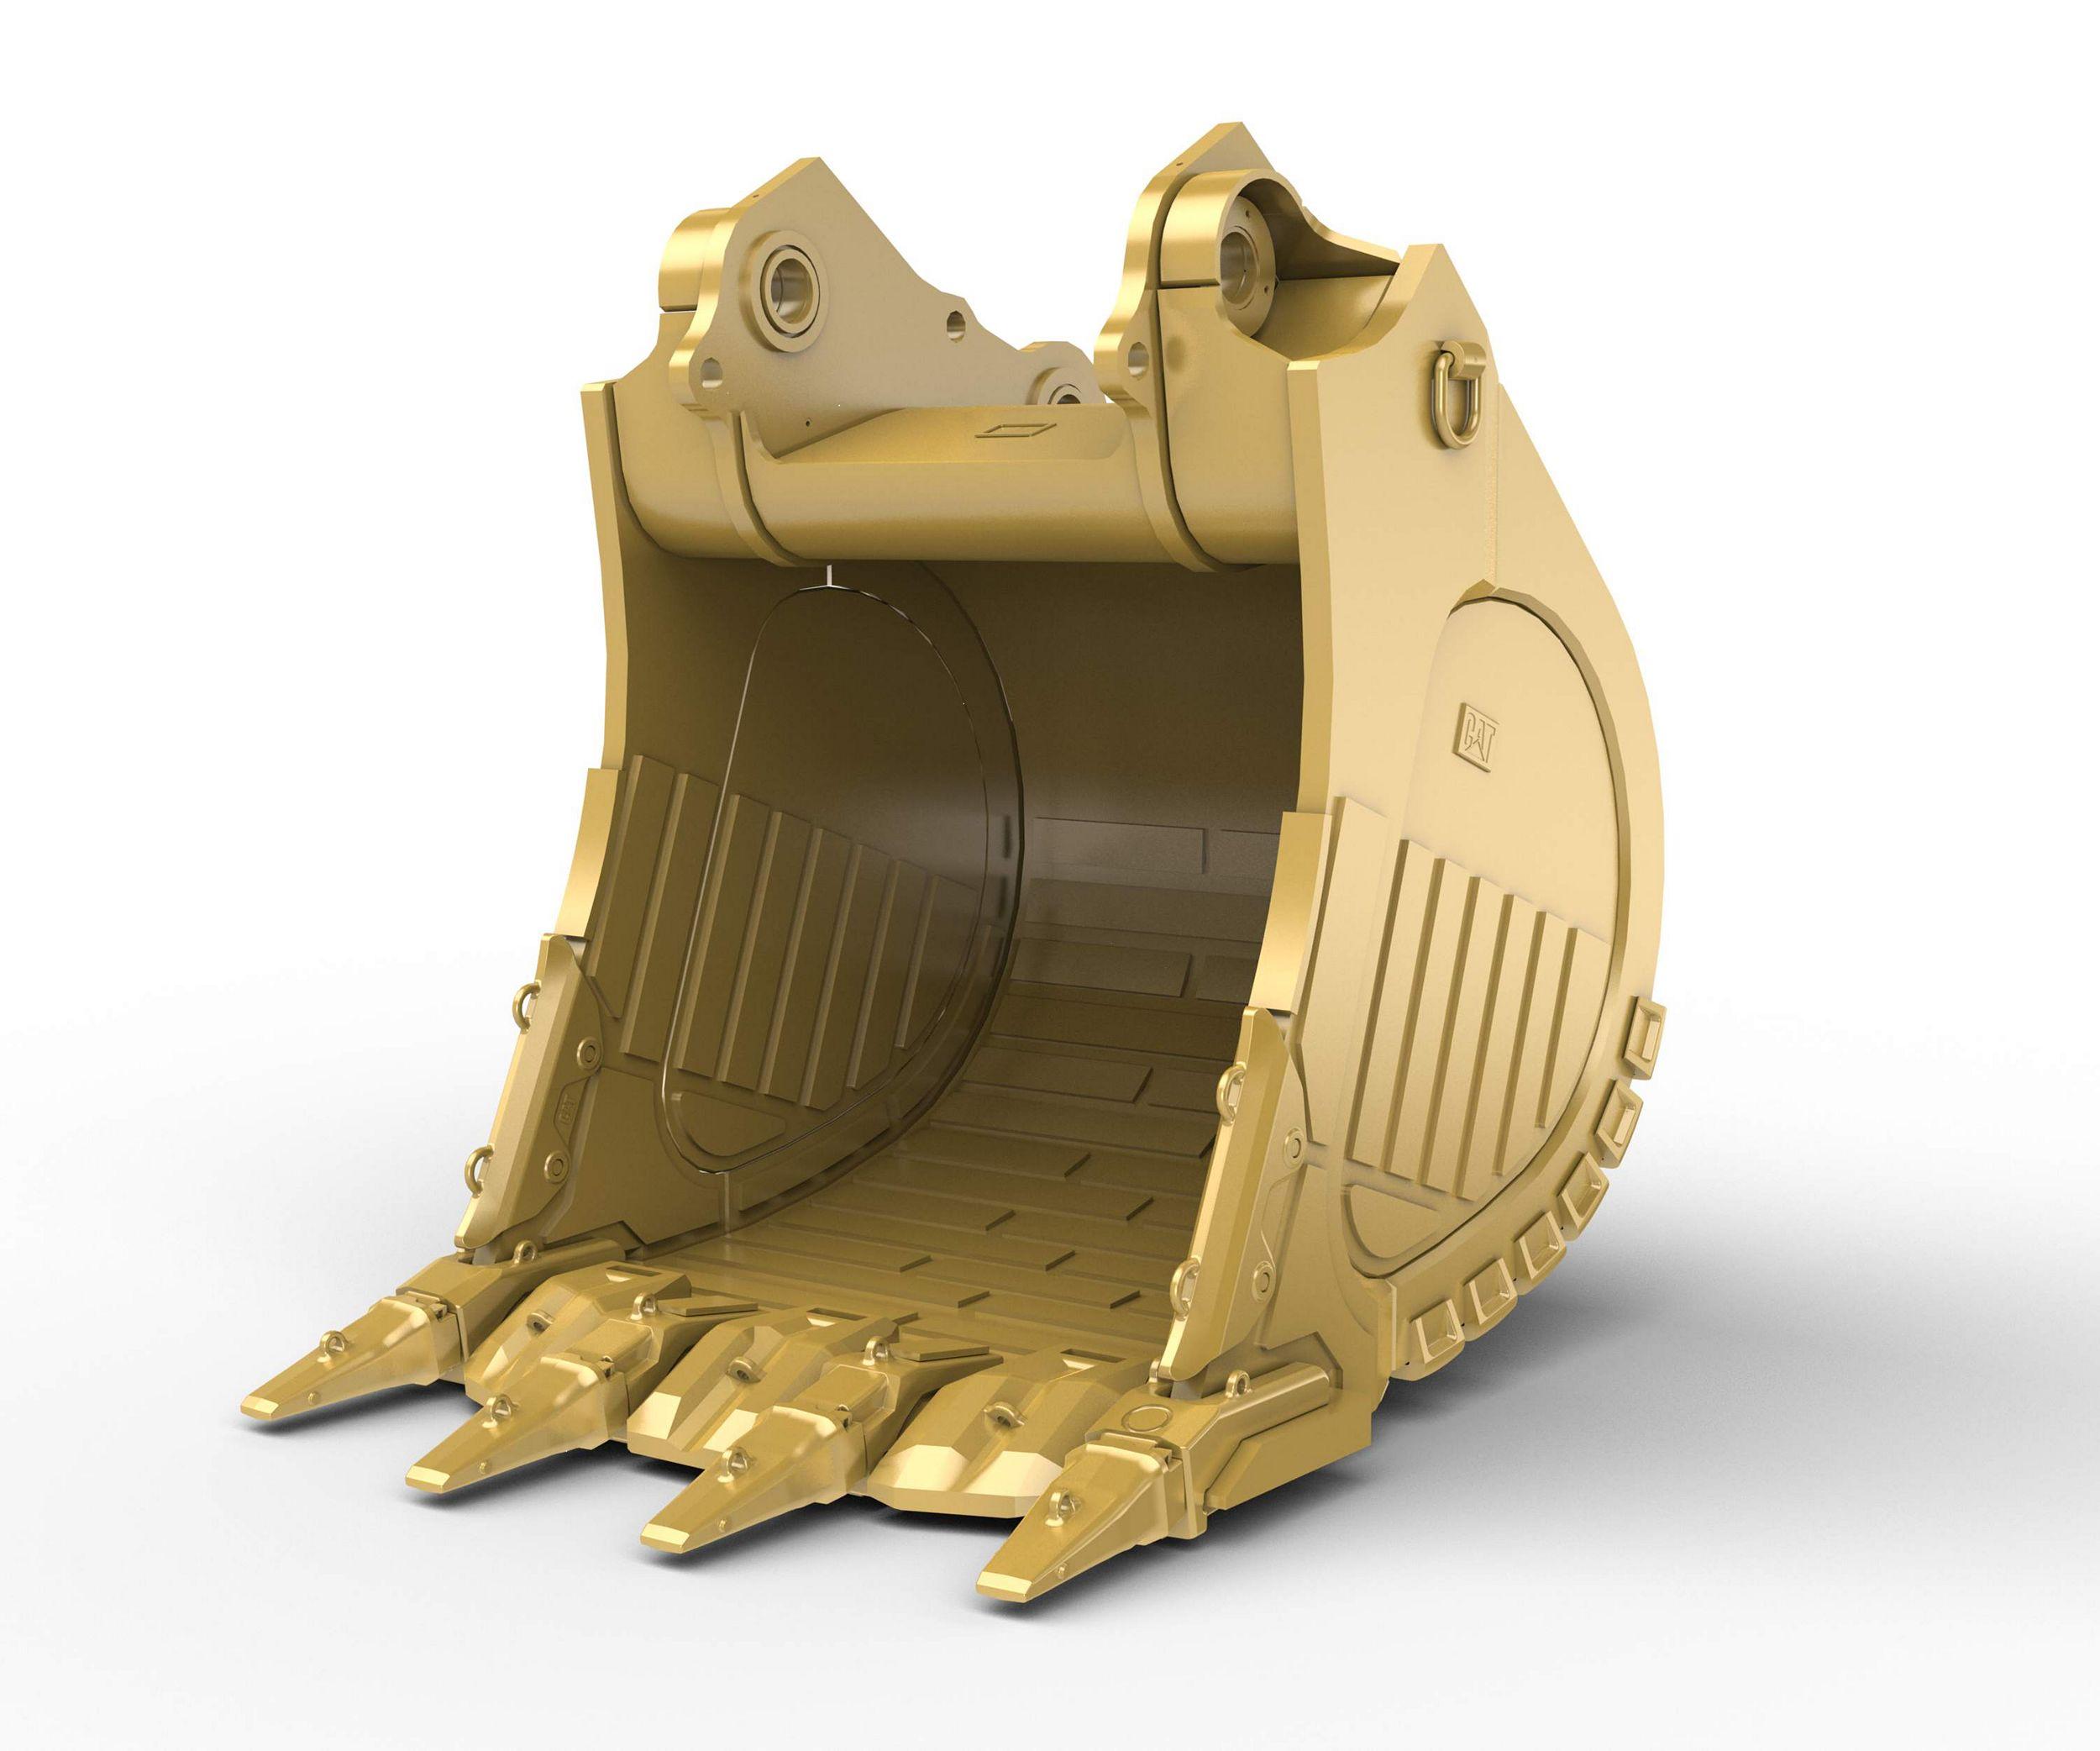 7.5m³ (9.8yd³) Heavy Rock bucket for the 6018 Hyd Mining Shovel